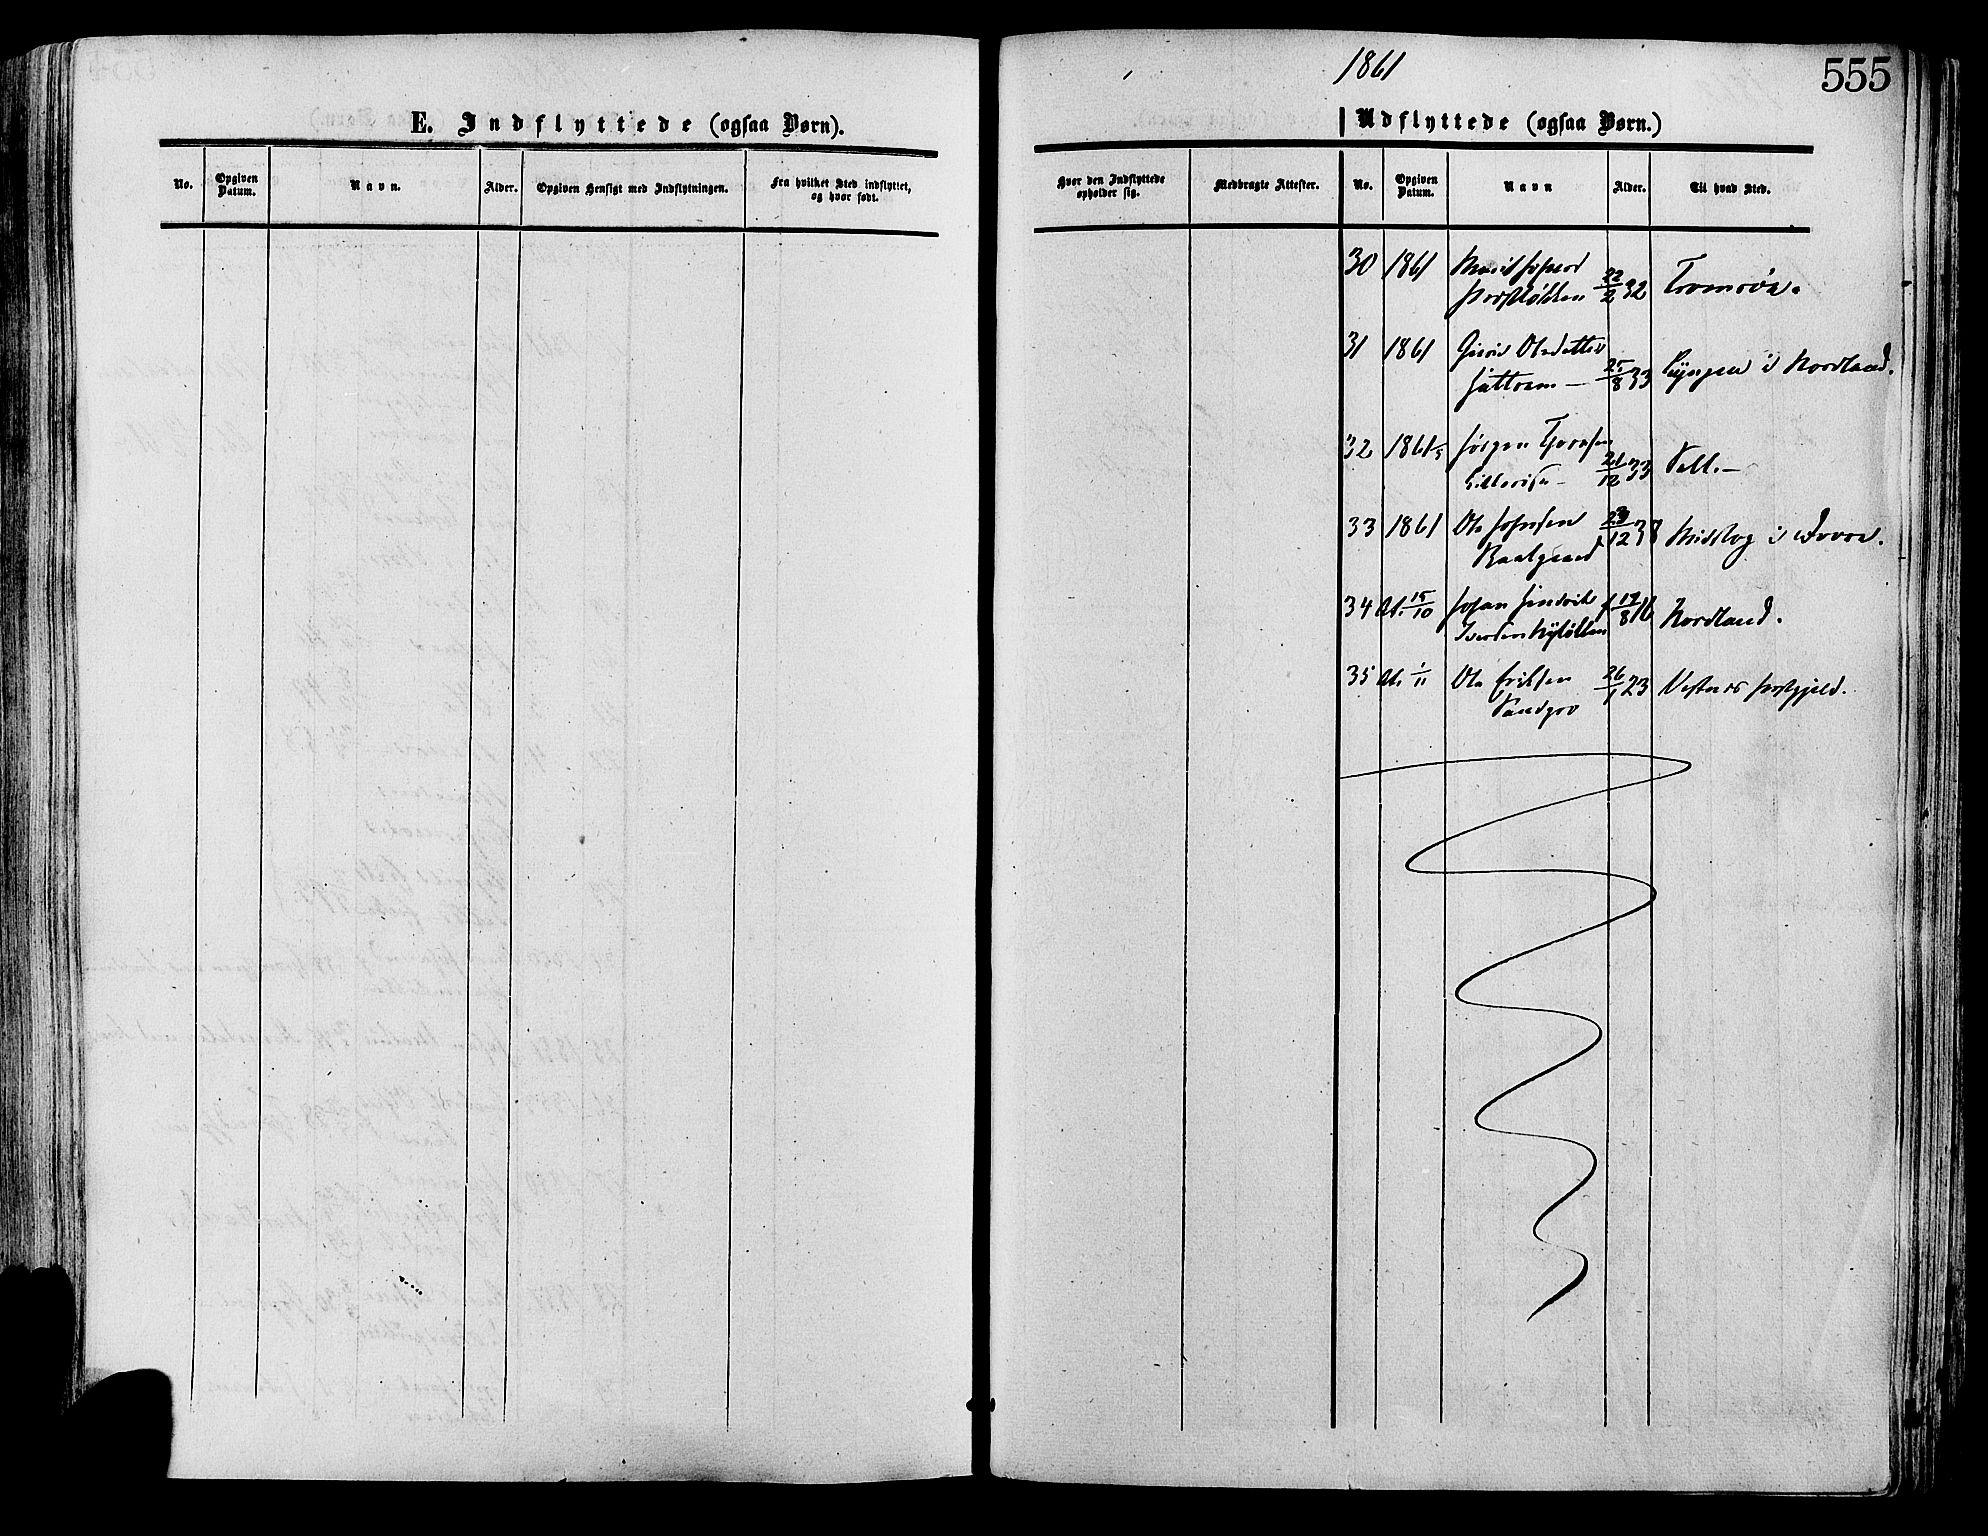 SAH, Lesja prestekontor, Ministerialbok nr. 8, 1854-1880, s. 555